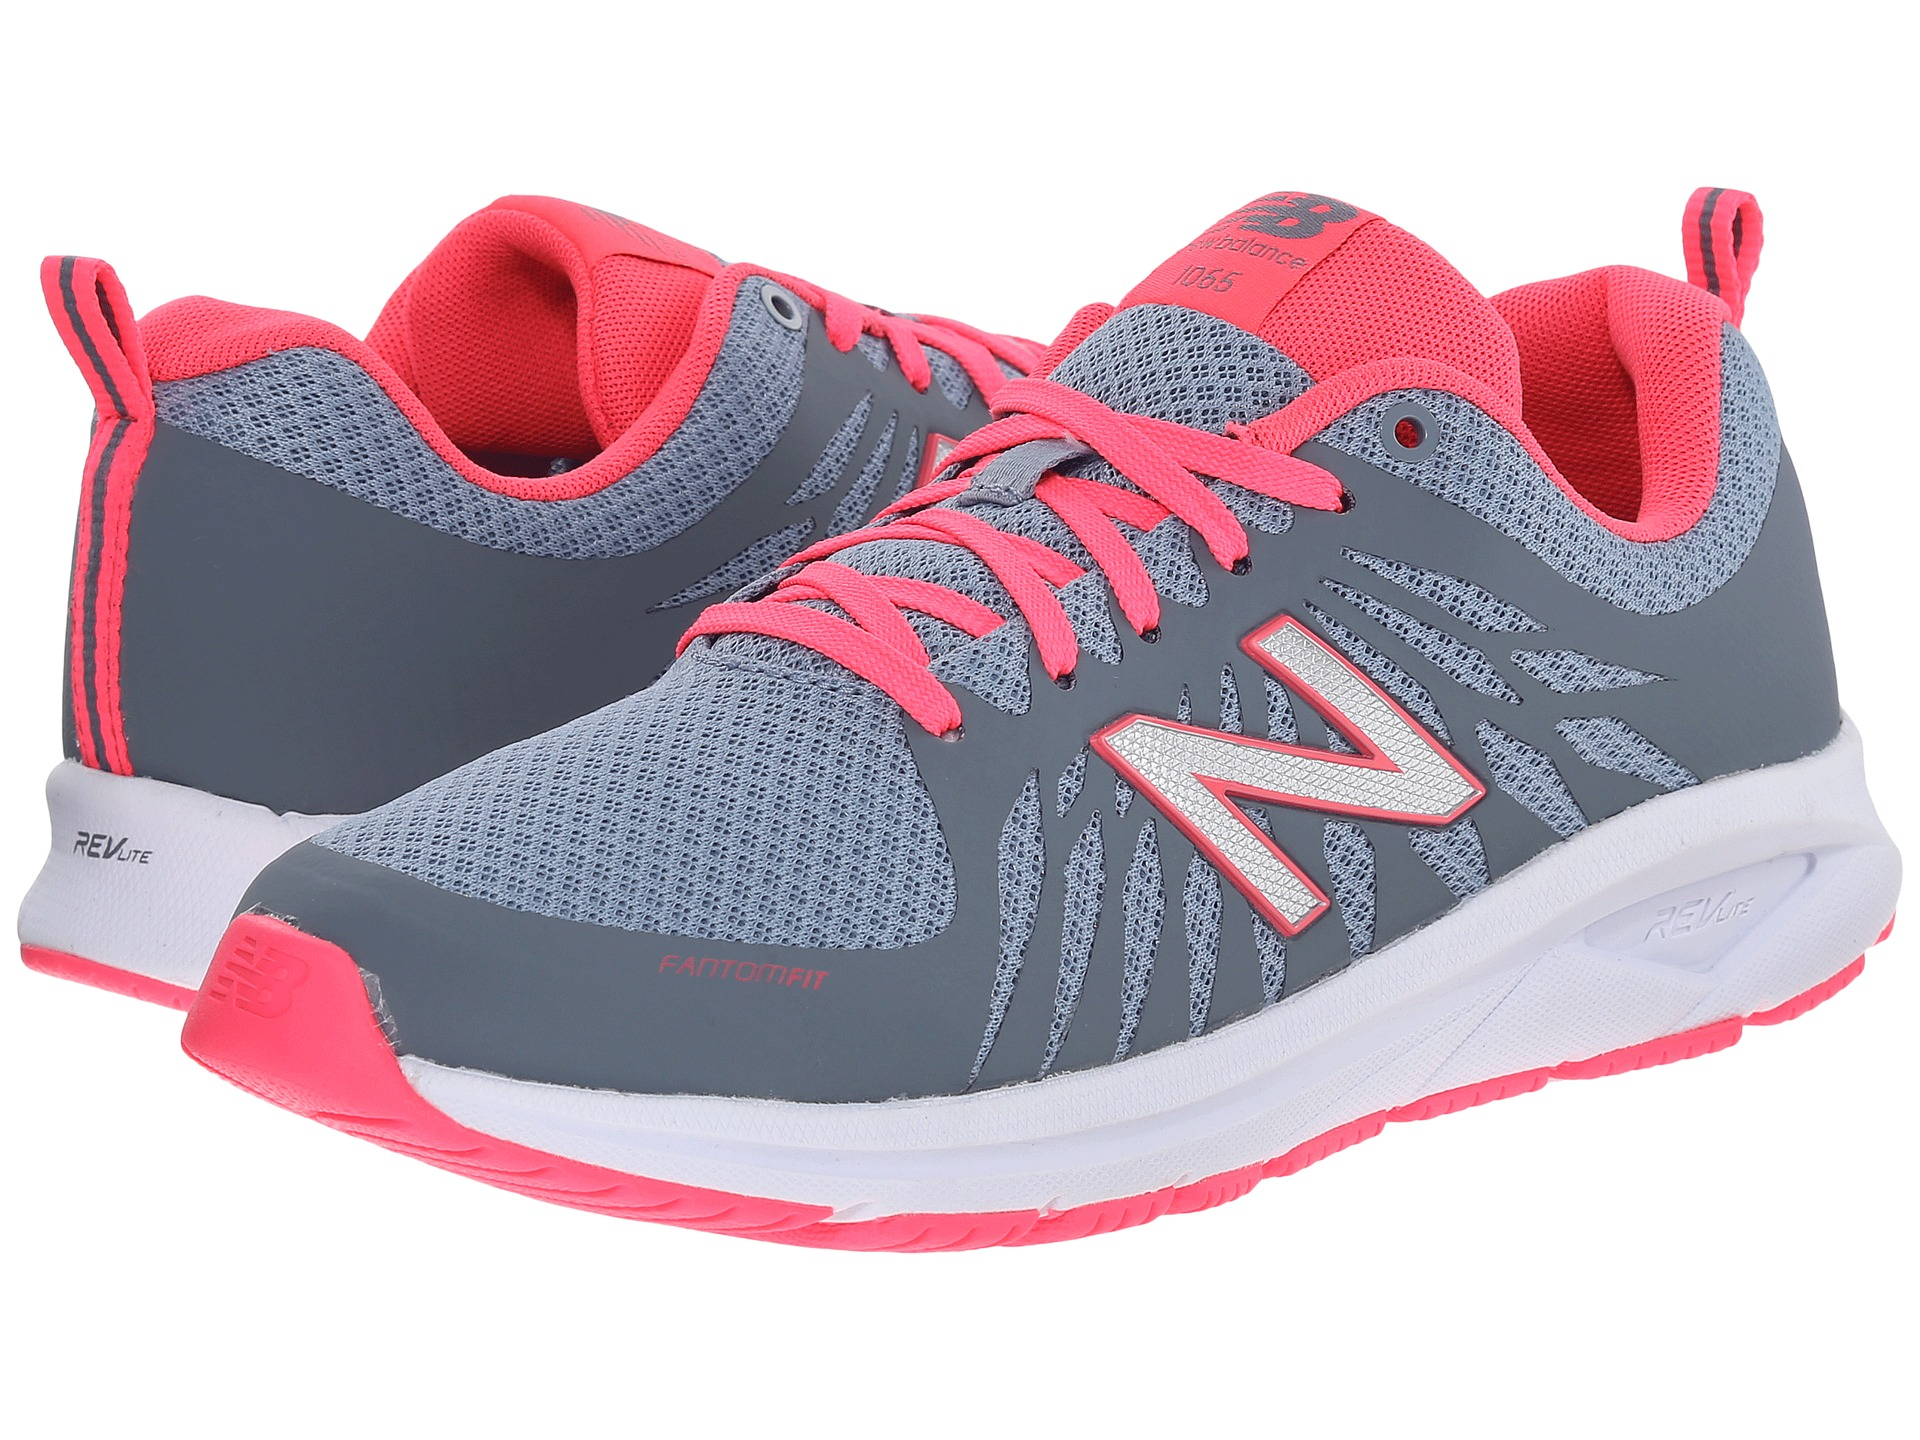 New Balance Women S Running Shoes Zappos